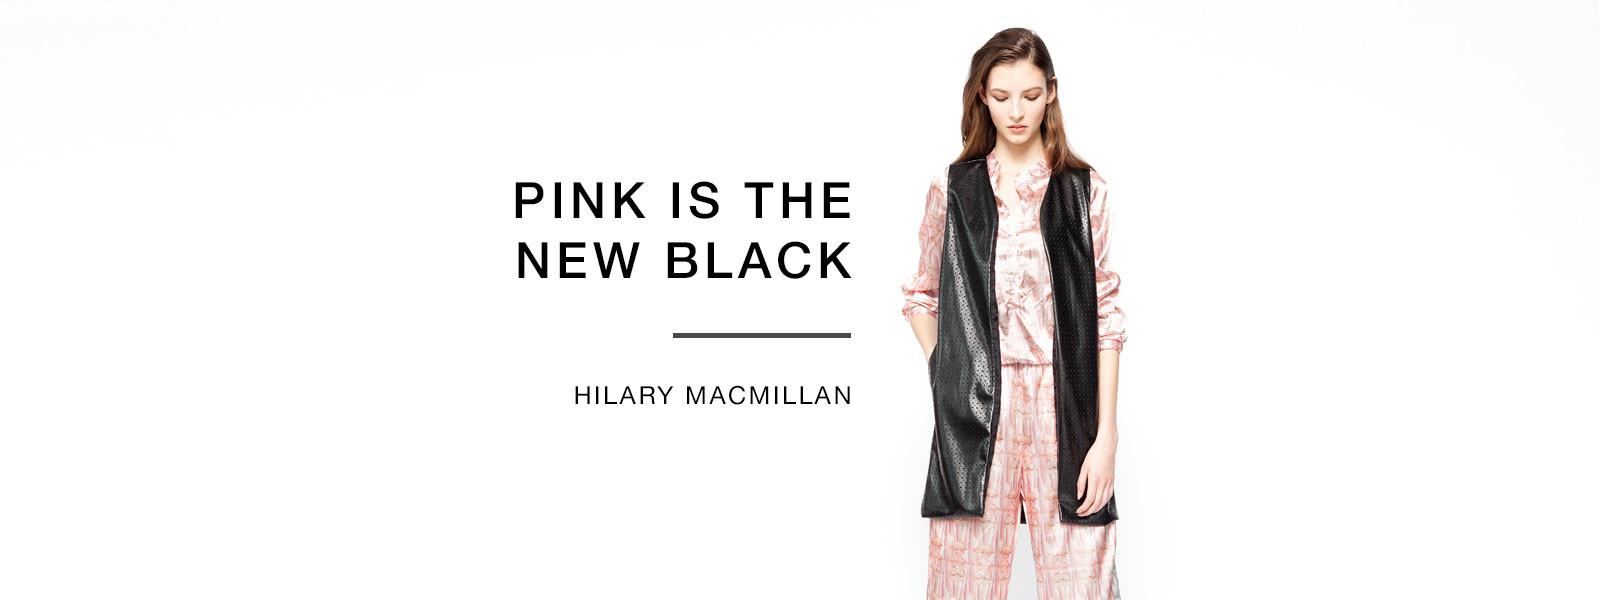 Hilary MacMillan PINK IS THE NEW BLACK